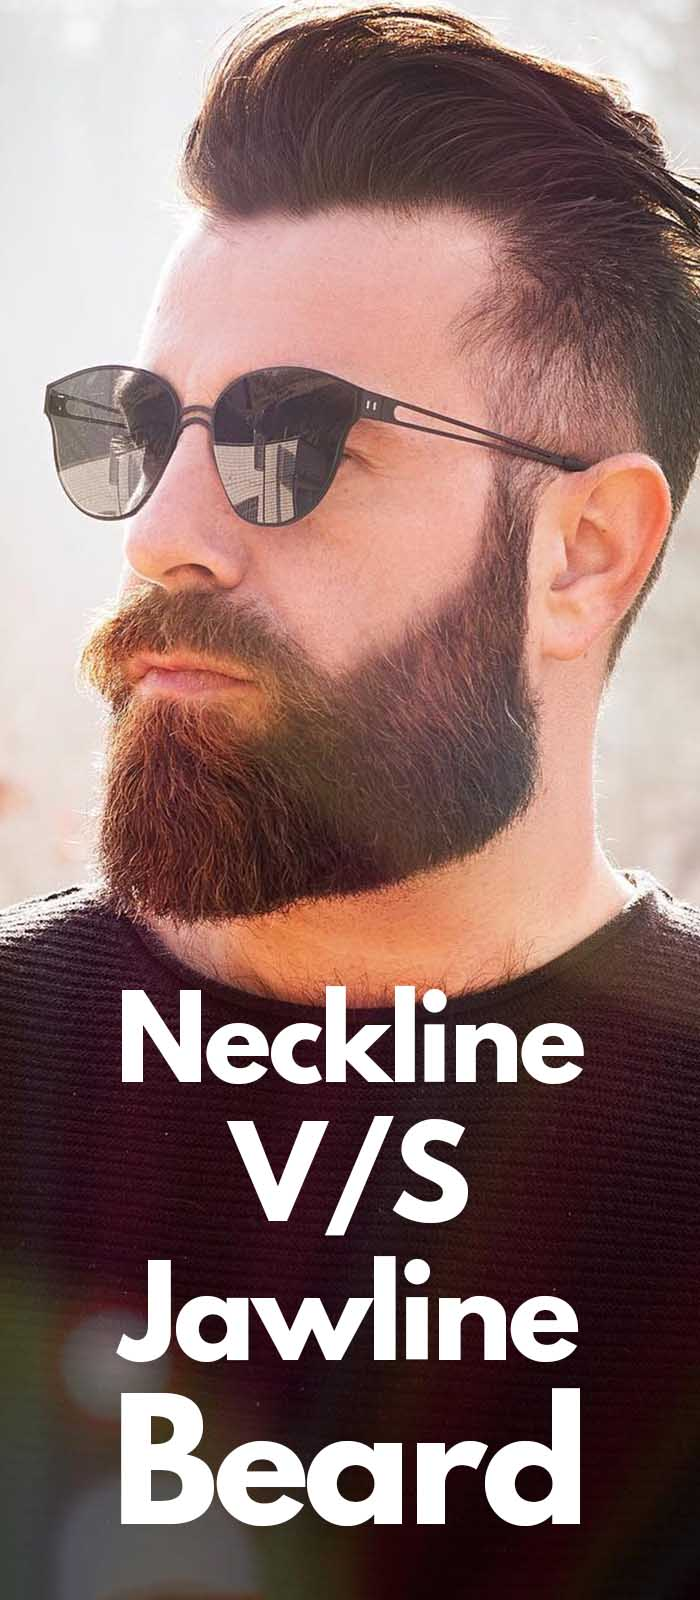 Neckline Beard VS Jawline Beard